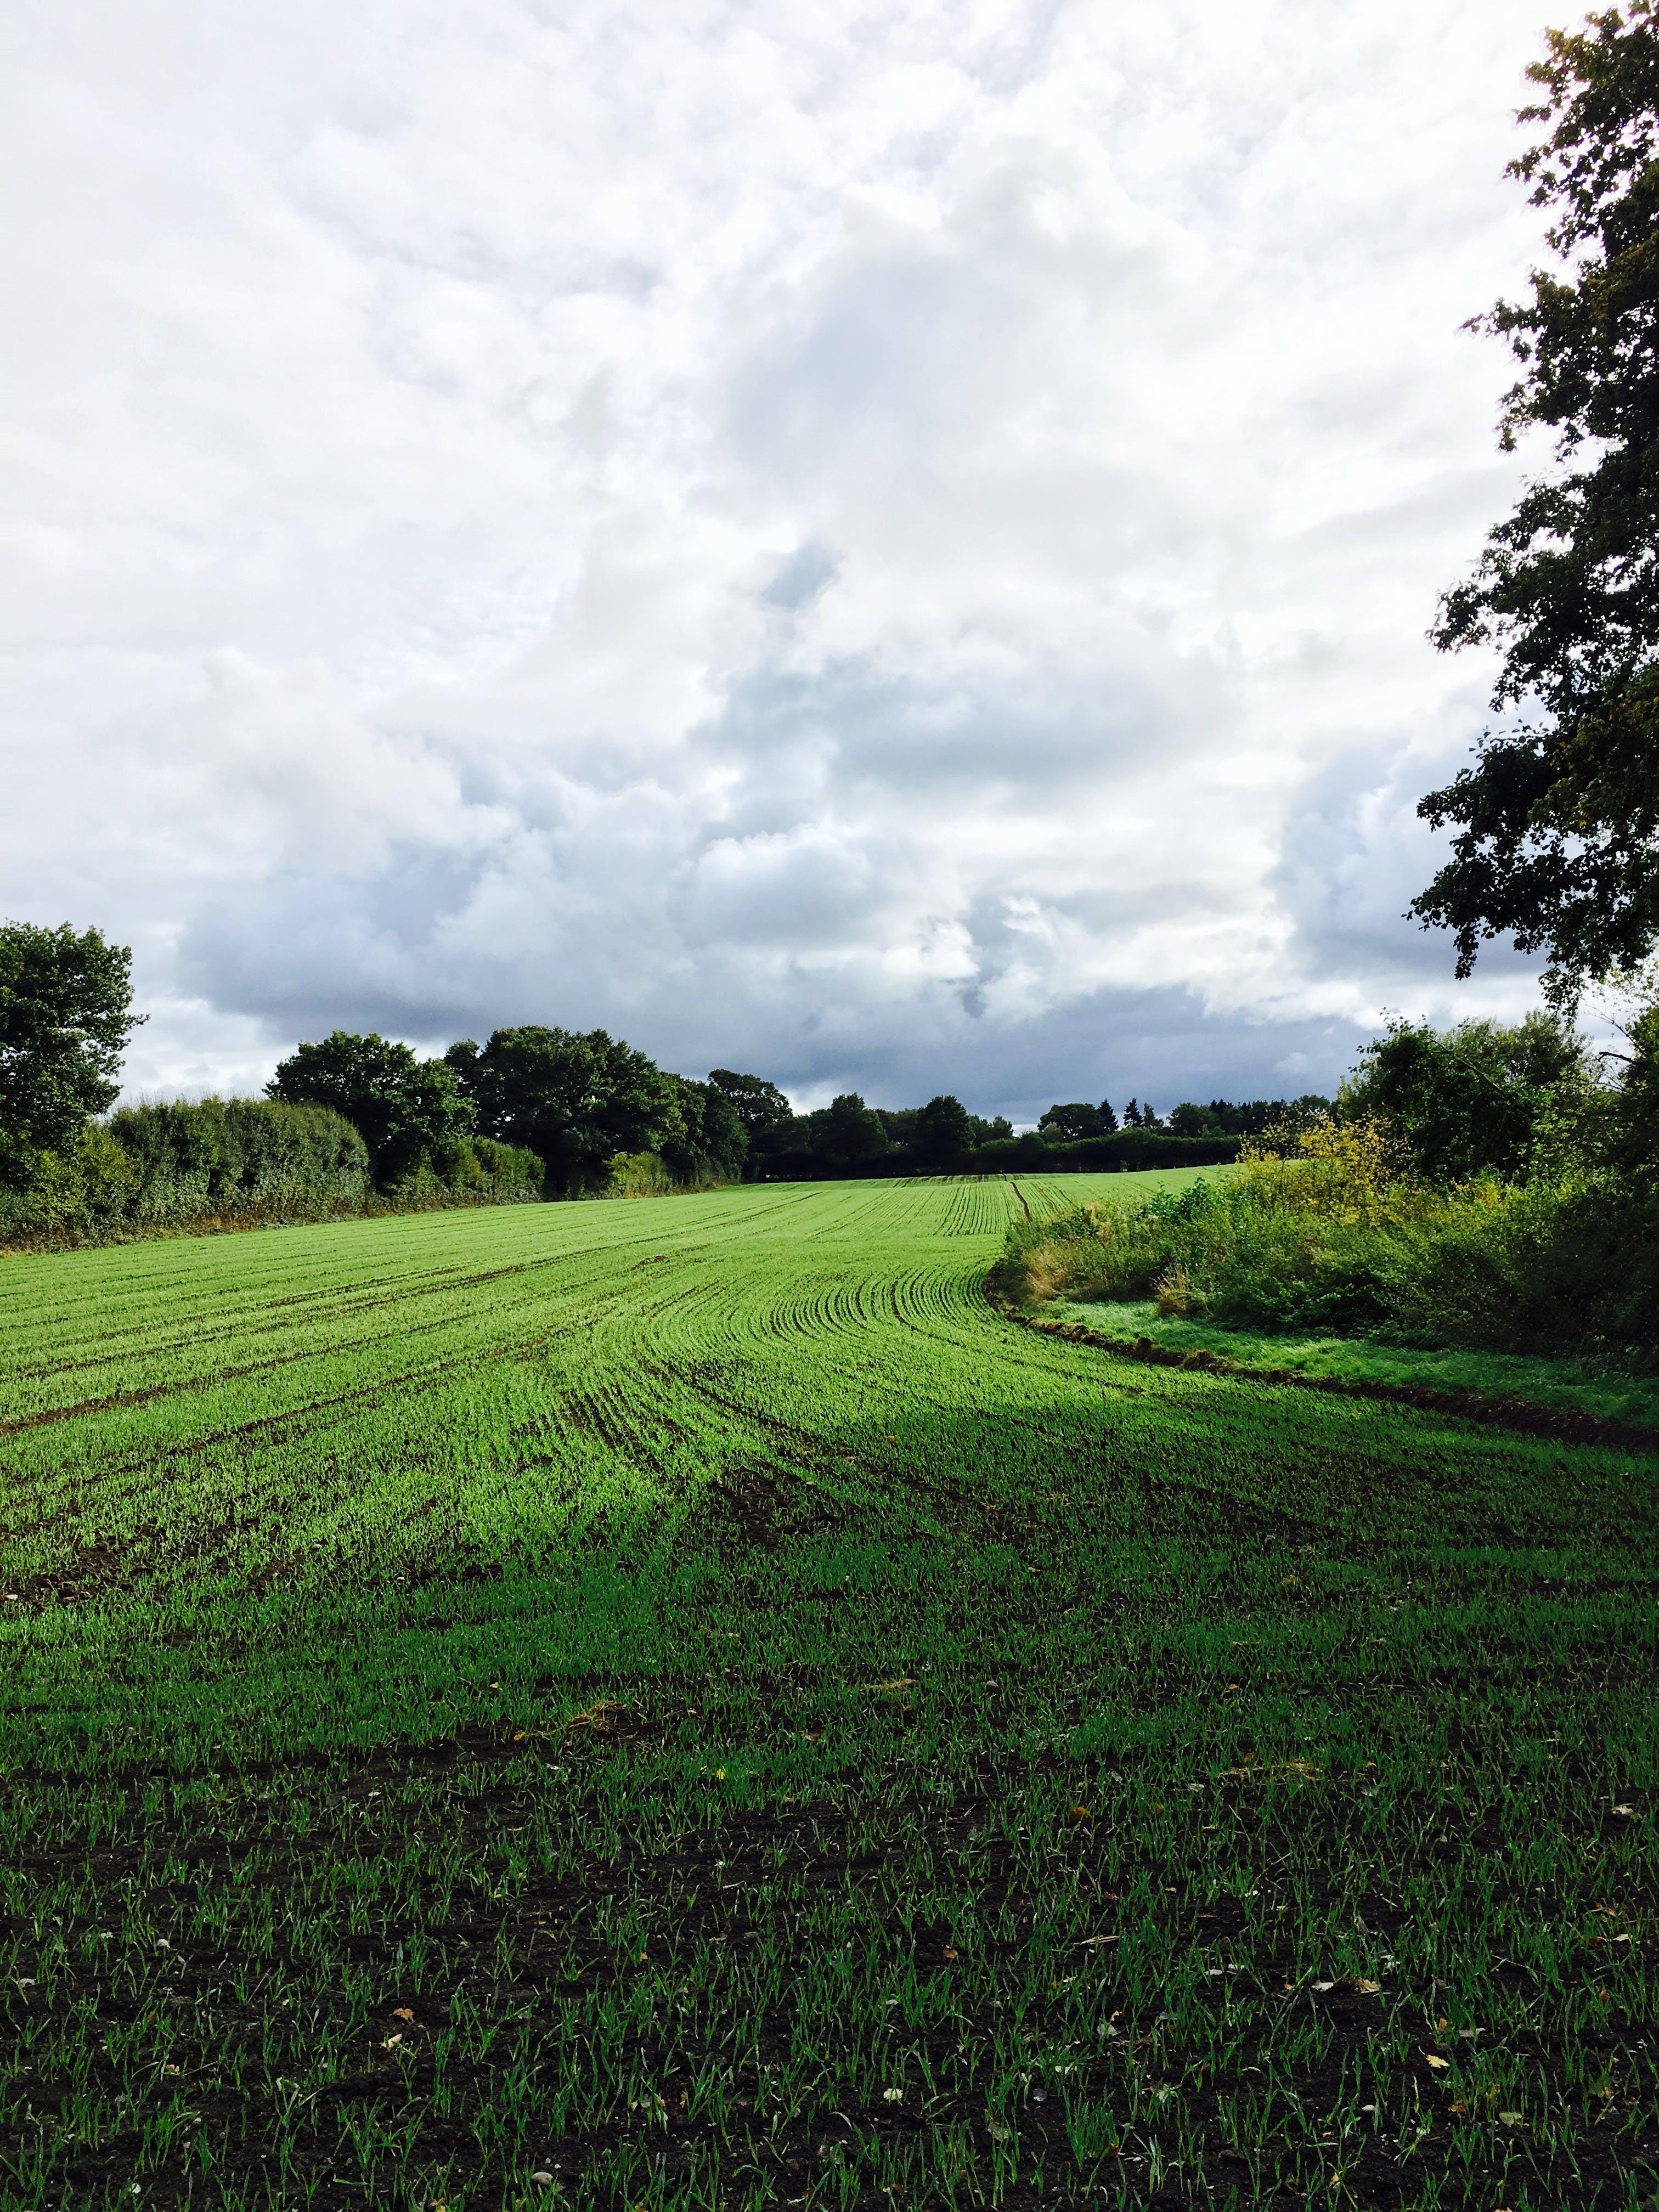 Gratis stockfoto met akkerland, bodem, boerderij, bomen